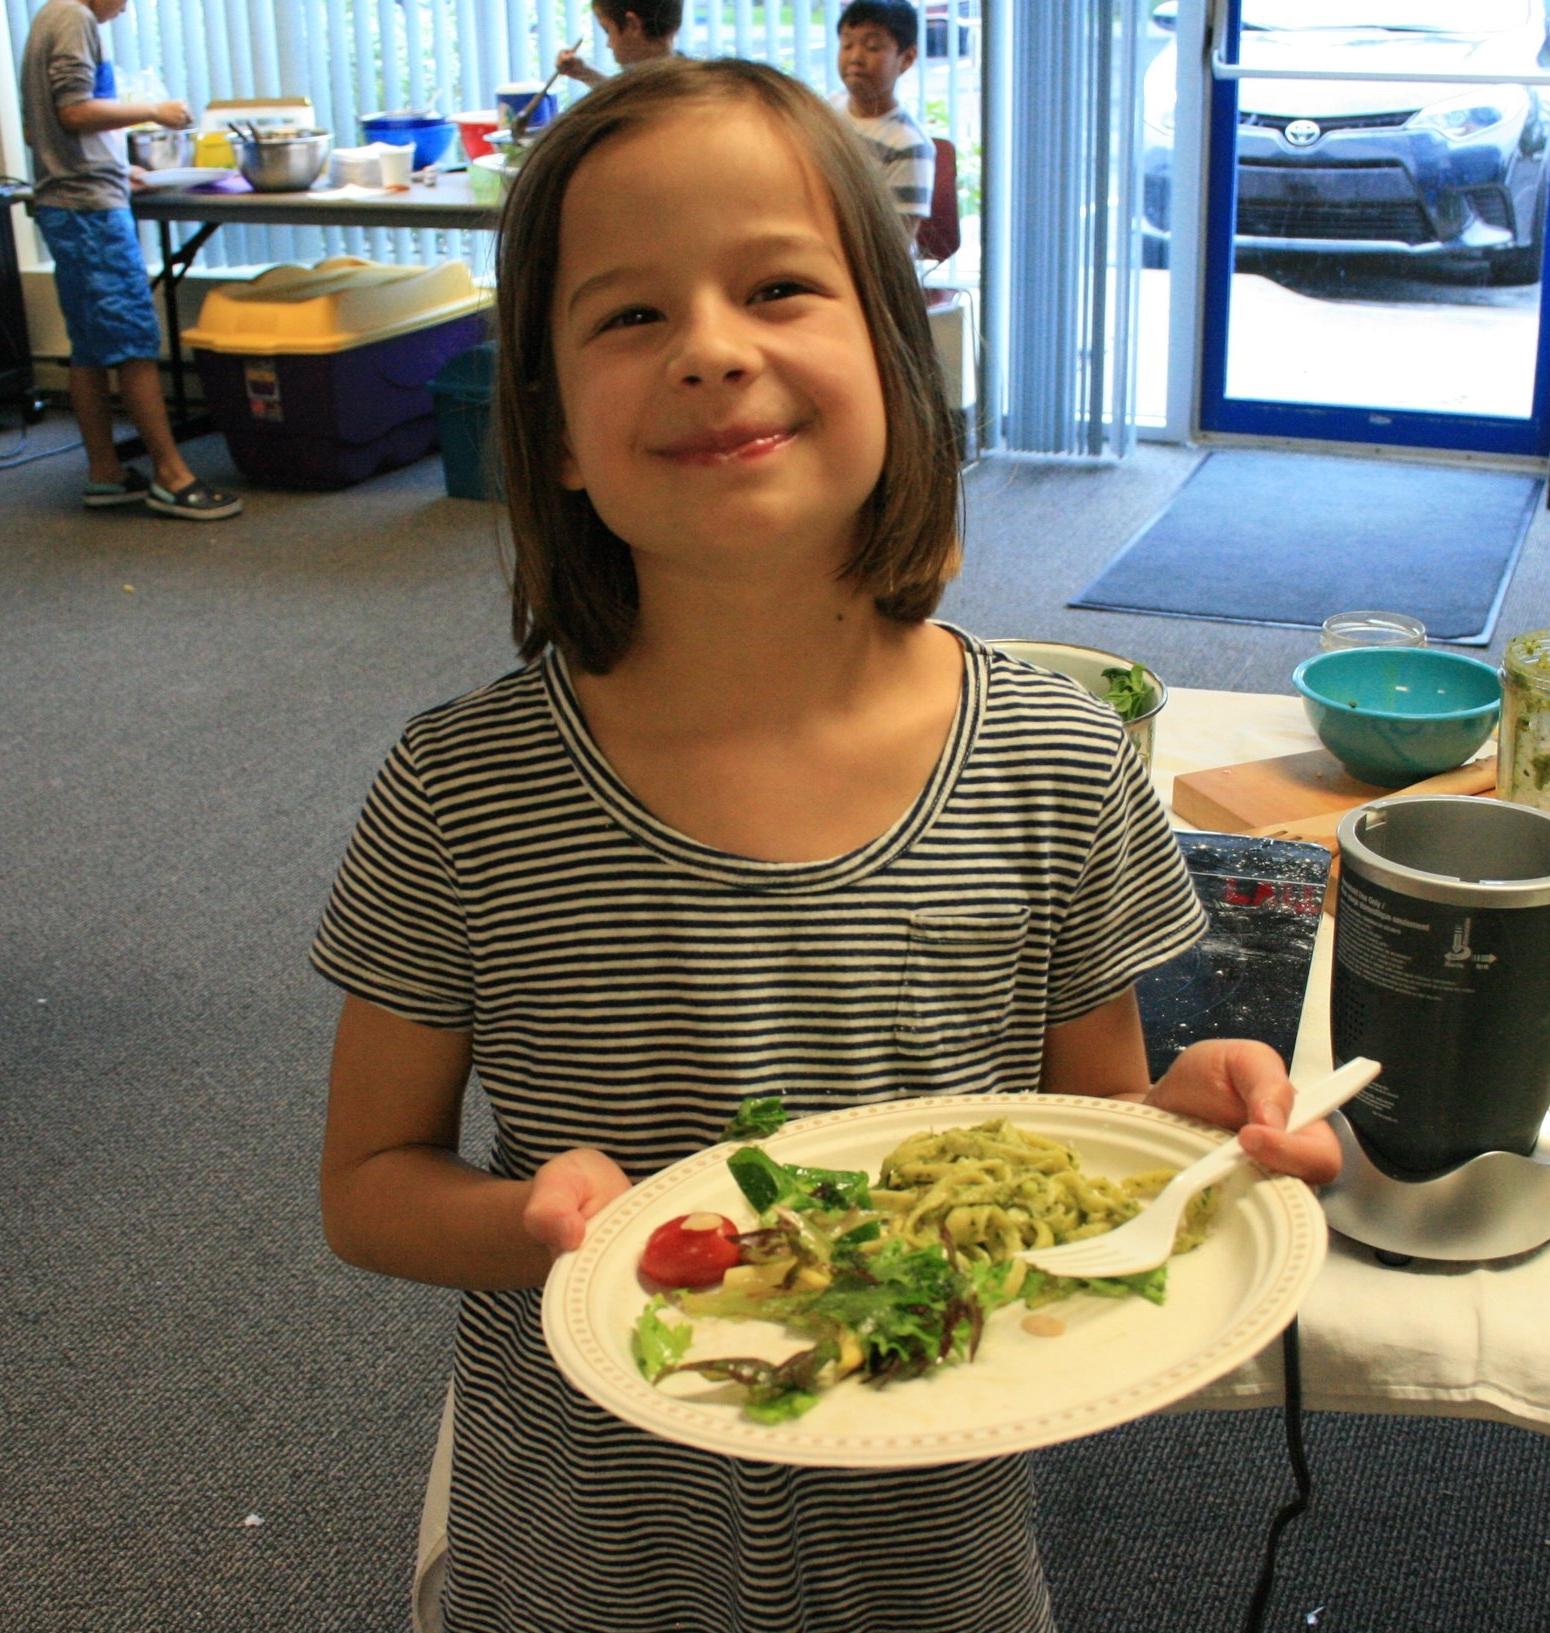 This kid ate three helpings of salad!